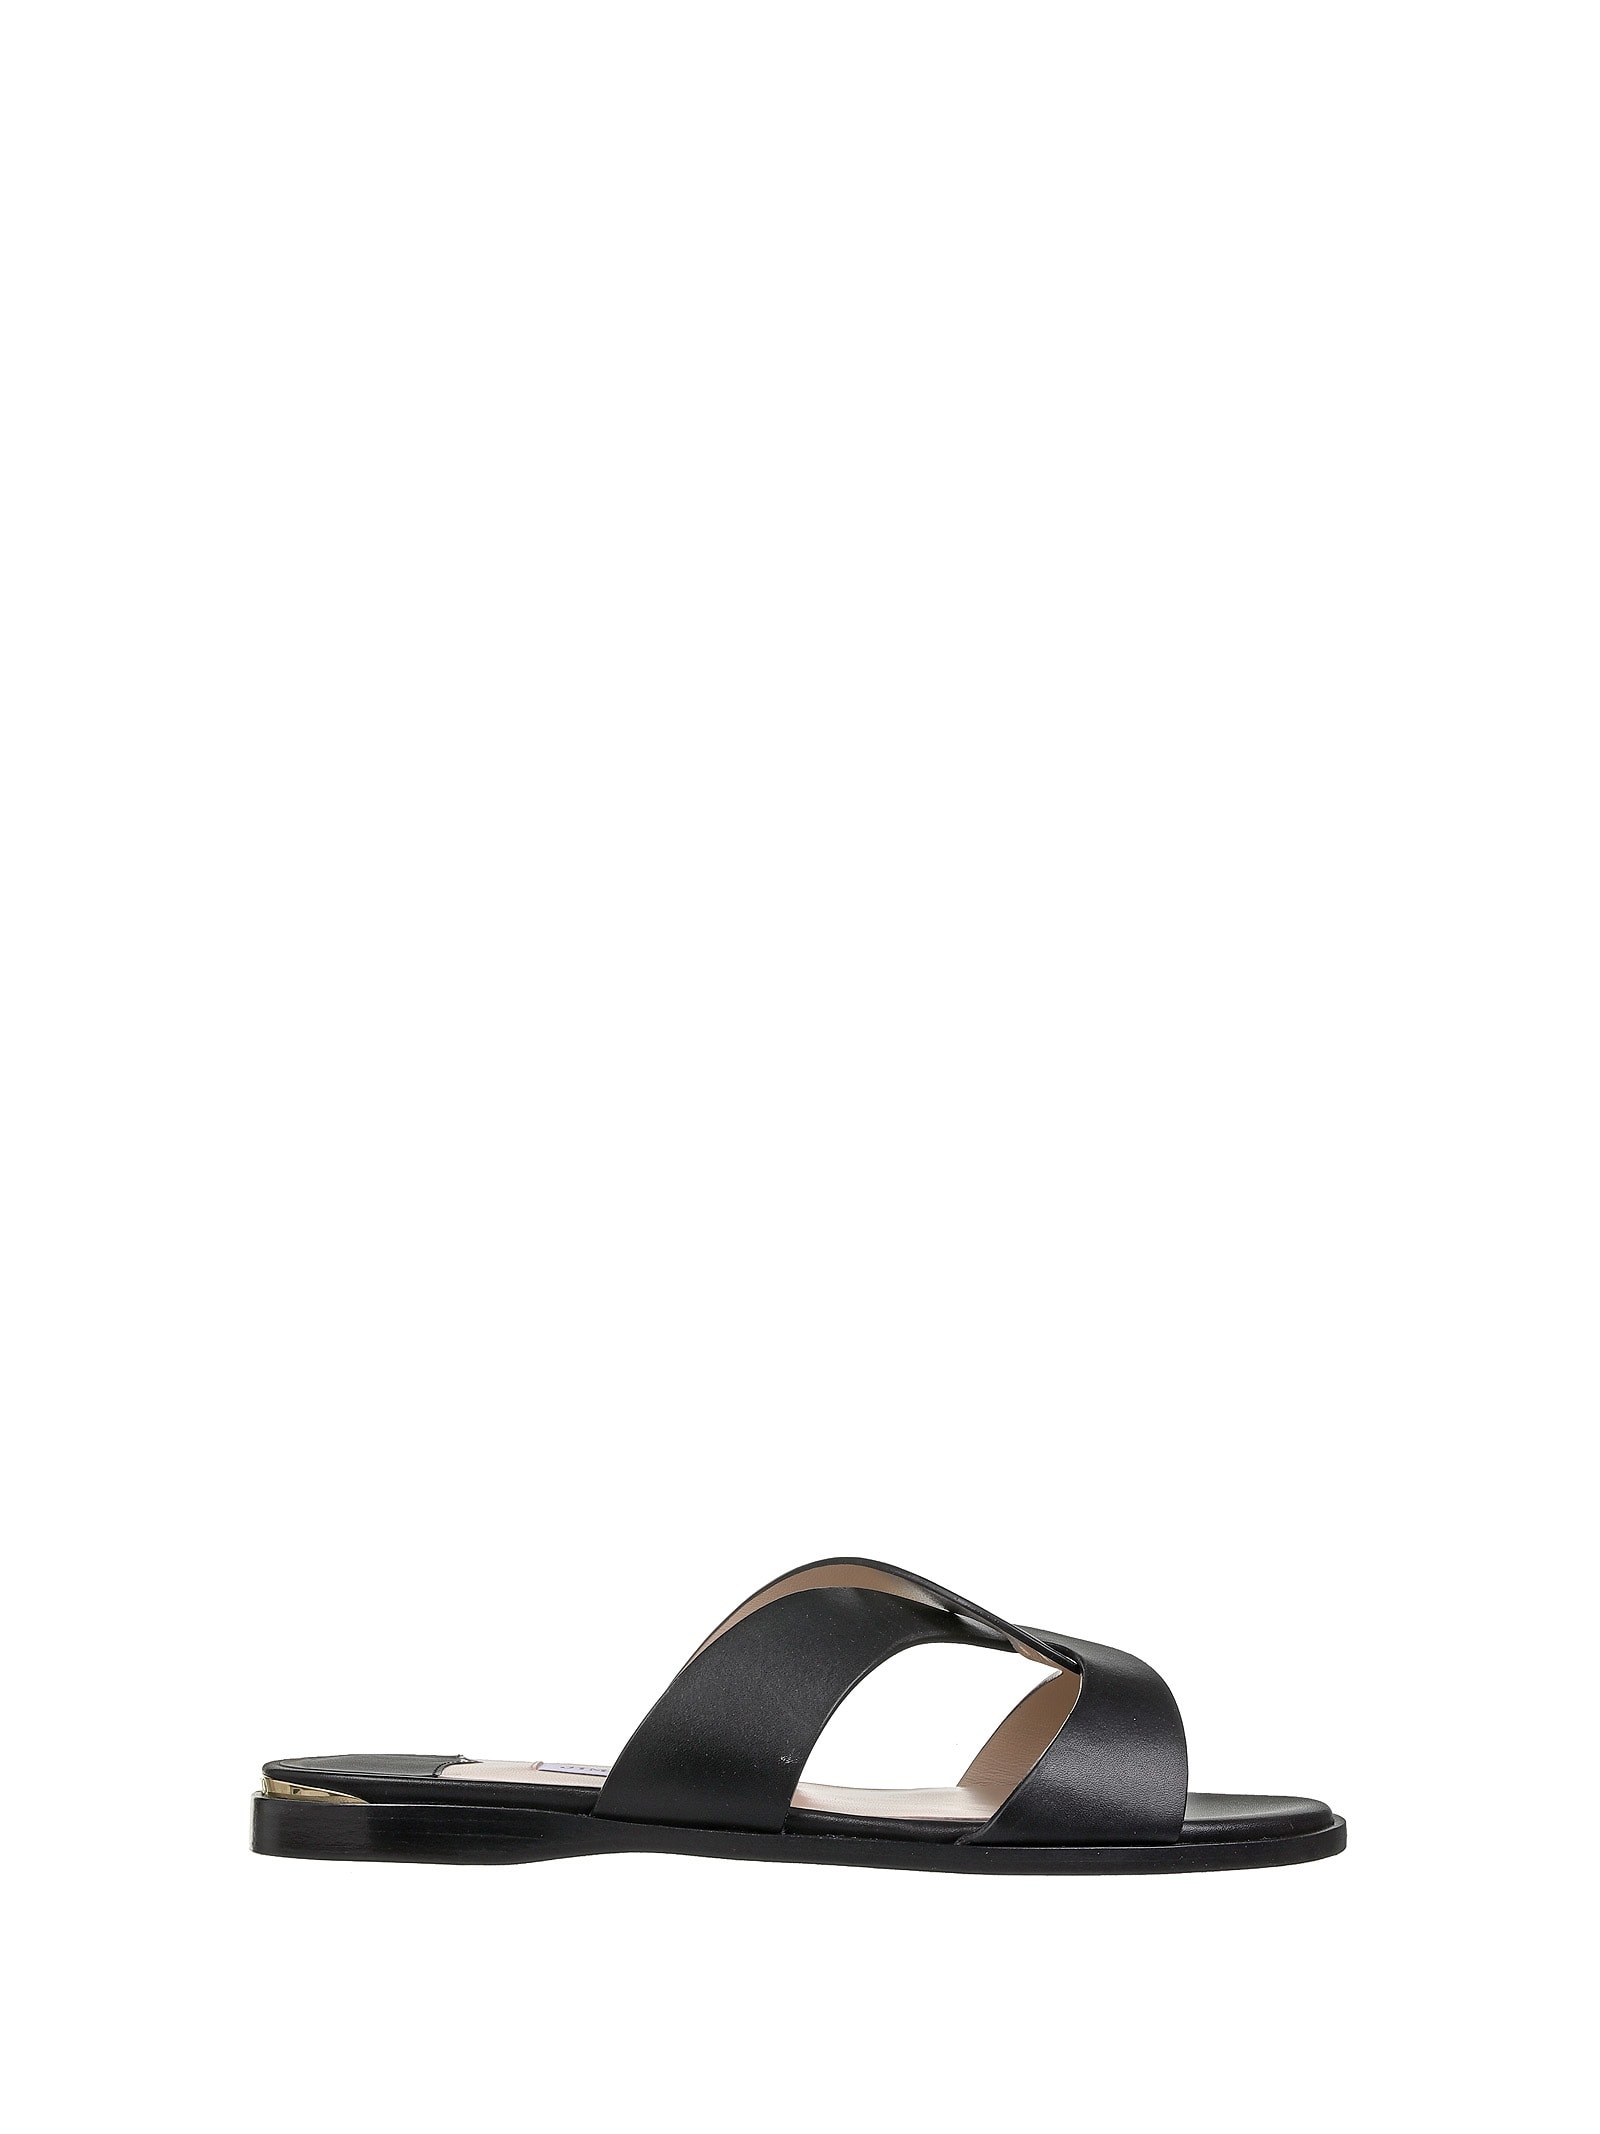 Jimmy Choo Jimmy Choo Atia Flat Sandals